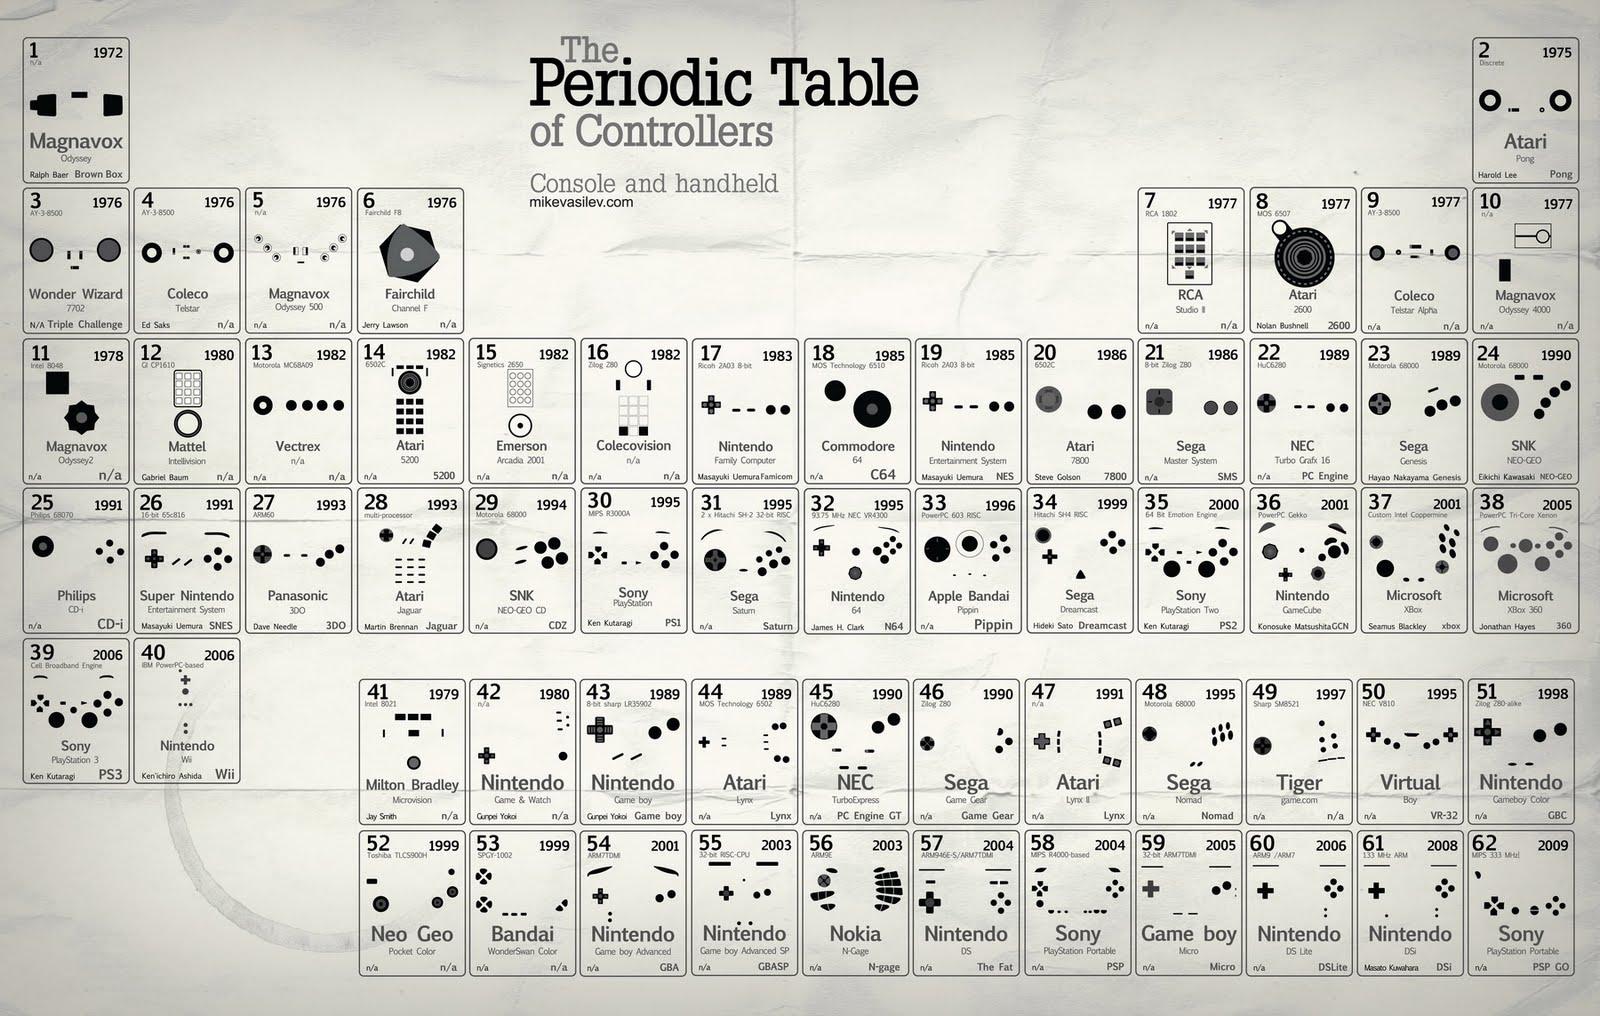 tabela periódica do video game